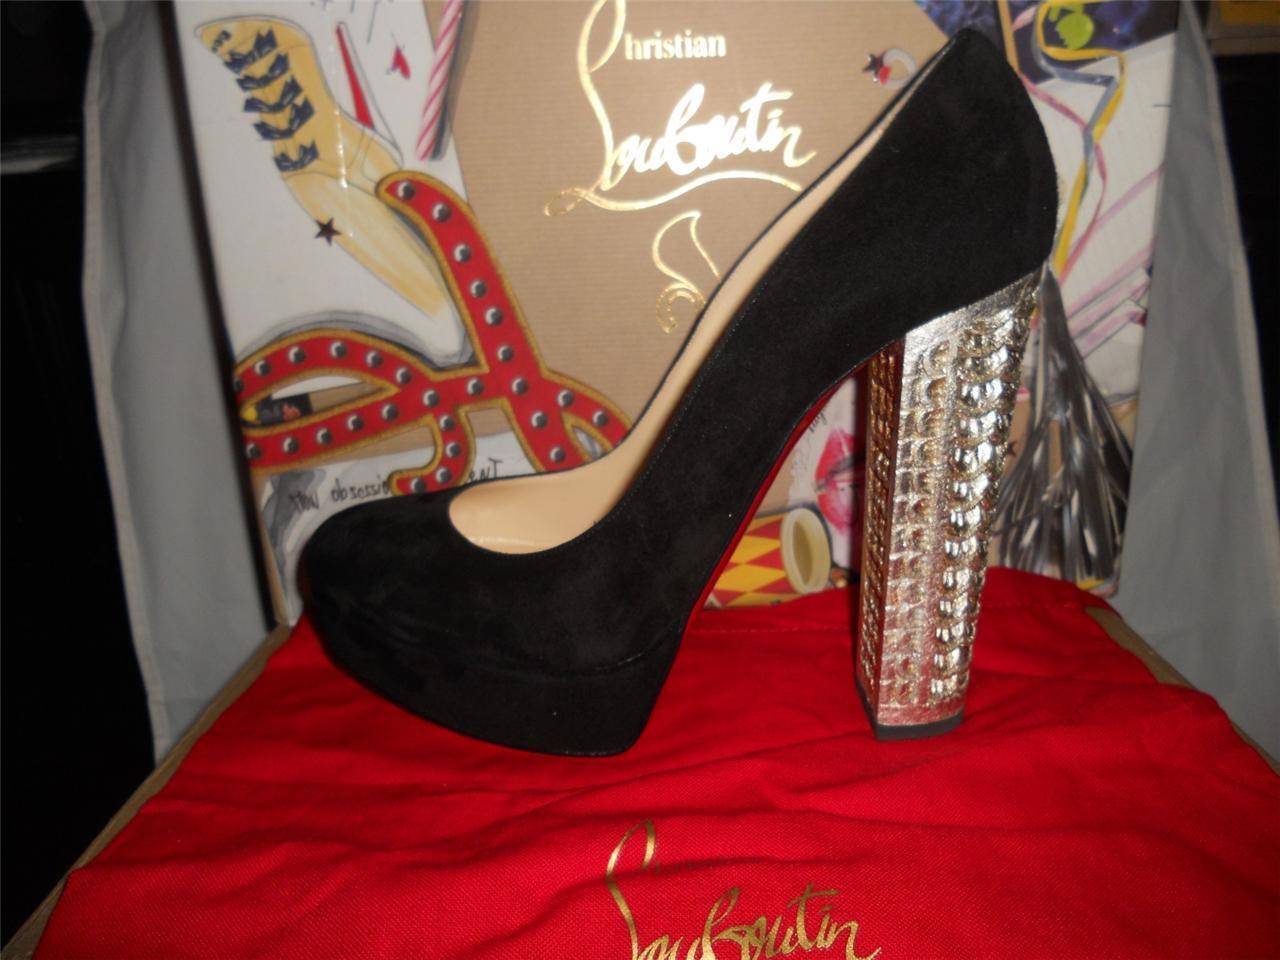 Christian Louboutin BOIS DORE 20ANS Black Suede Platform Heels Heels Heels Pumps shoes  1395 4a76b3